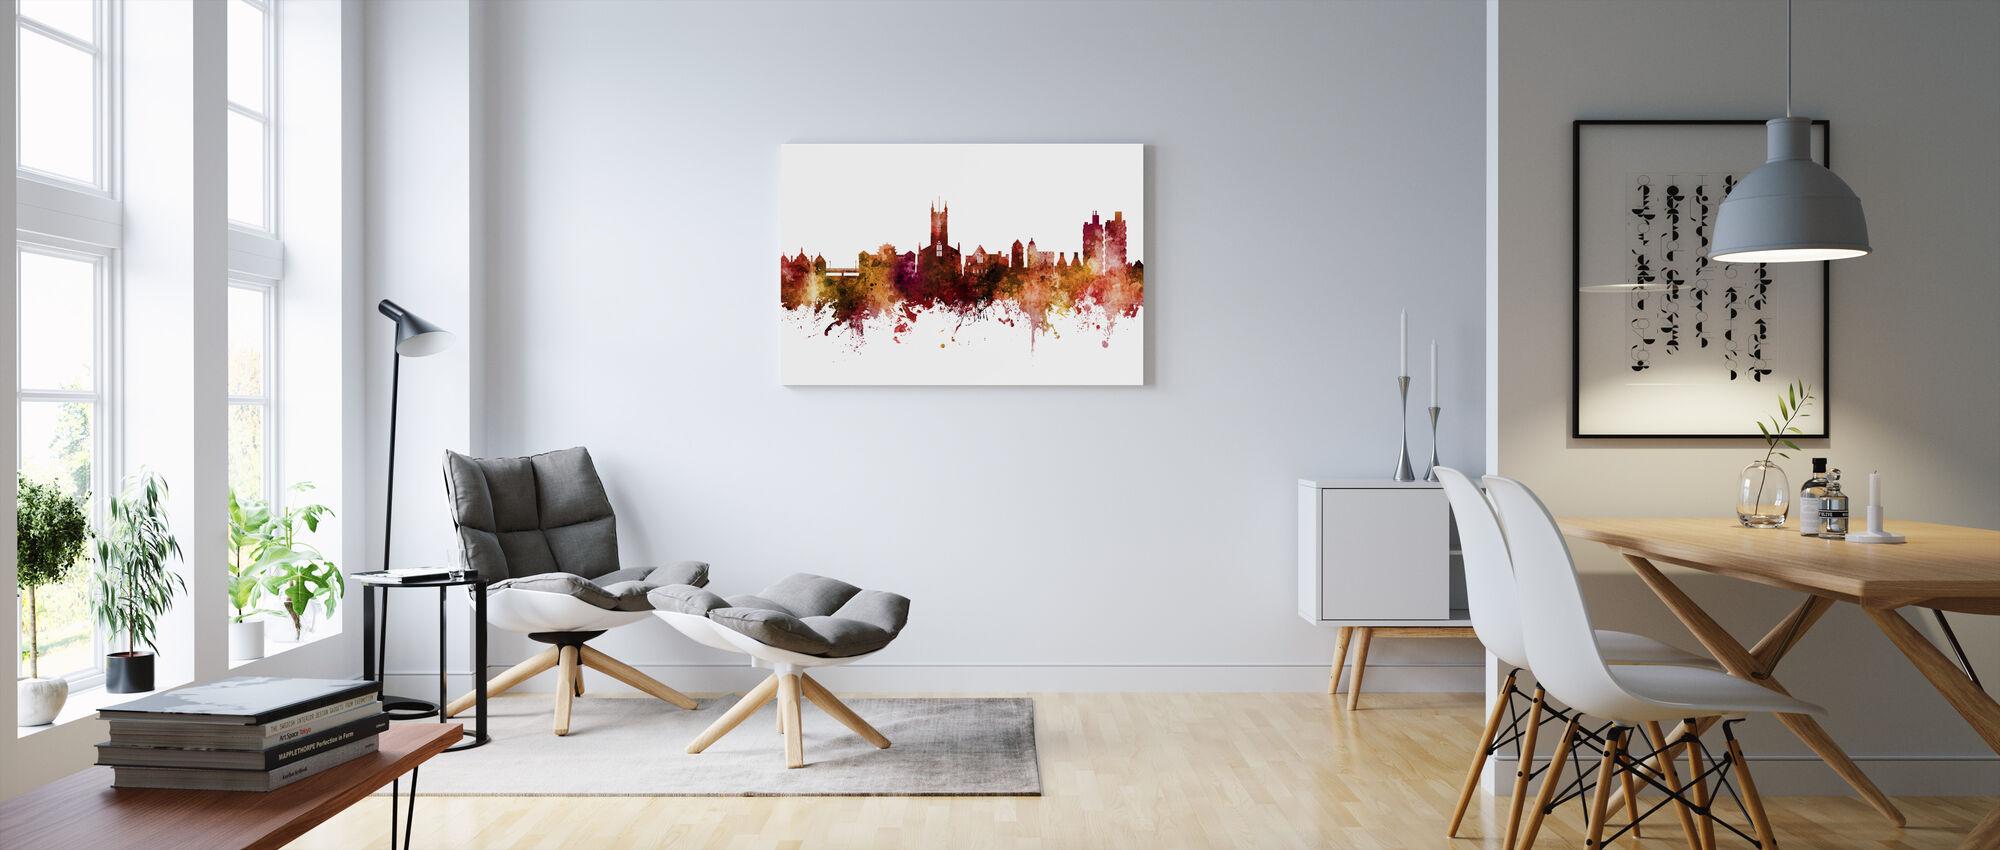 Stoke-on-Trent England Skyline - Canvas print - Living Room